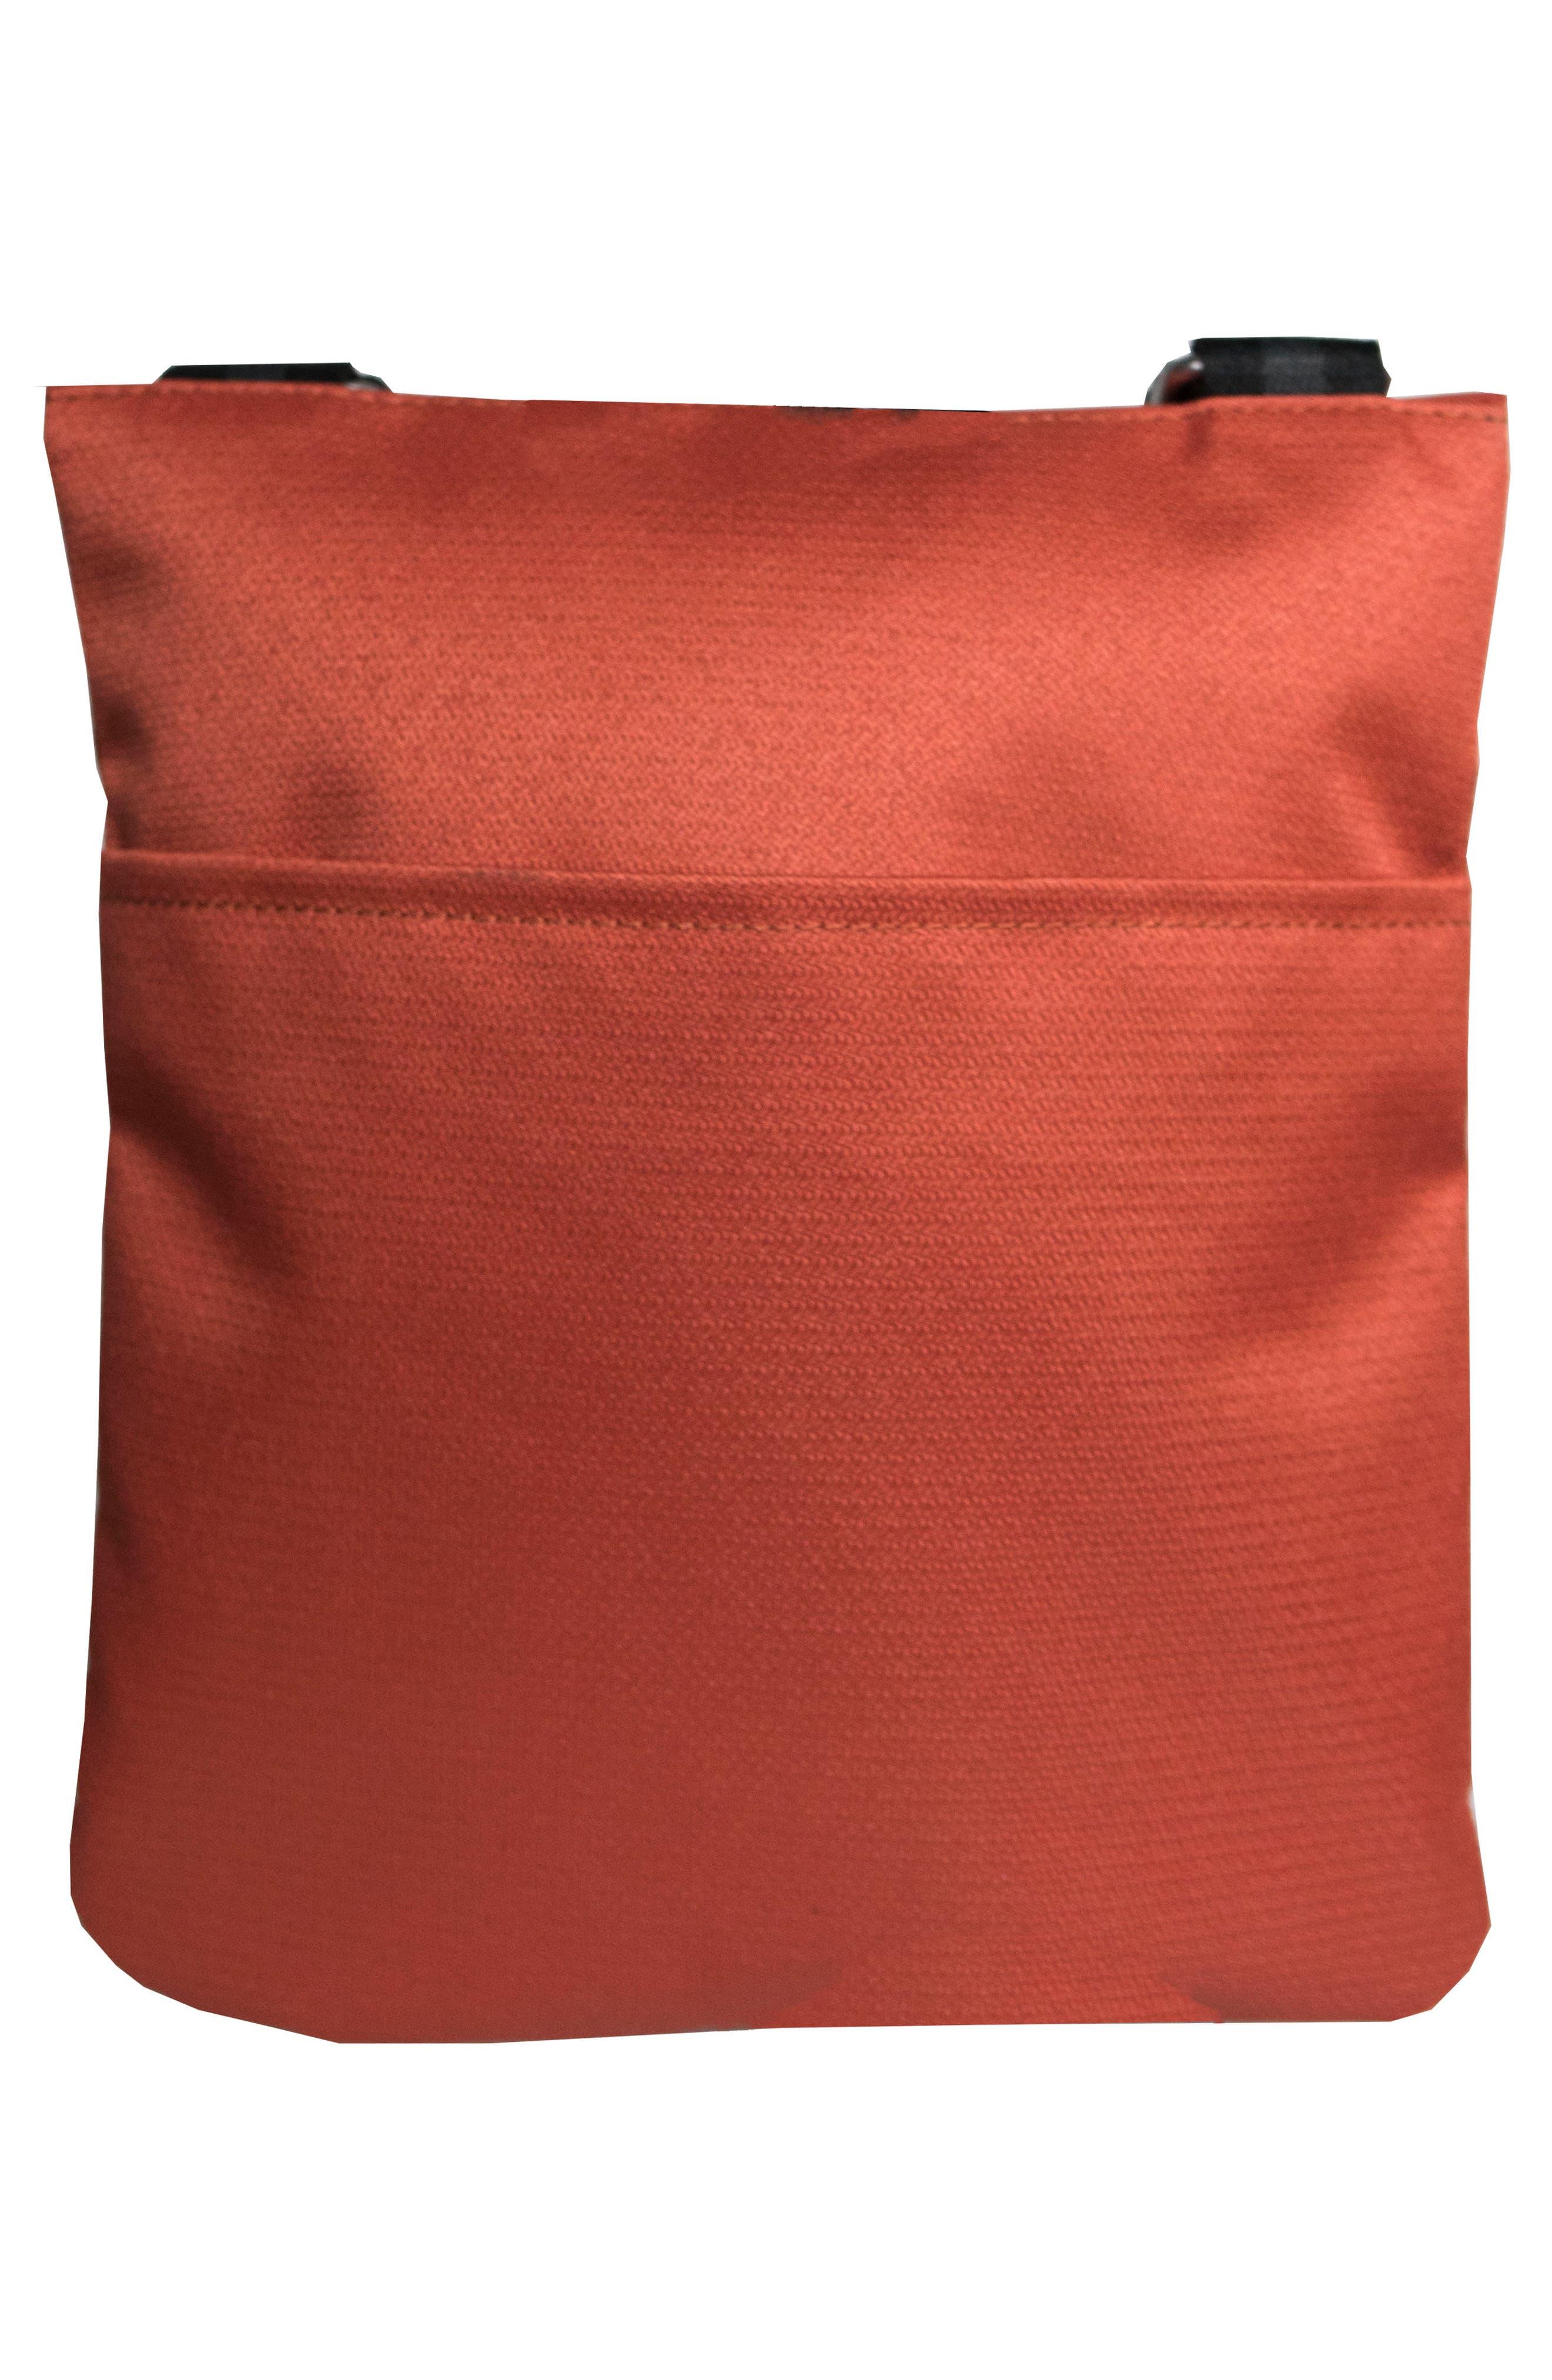 Small Pica Crossbody Bag,                             Alternate thumbnail 2, color,                             600